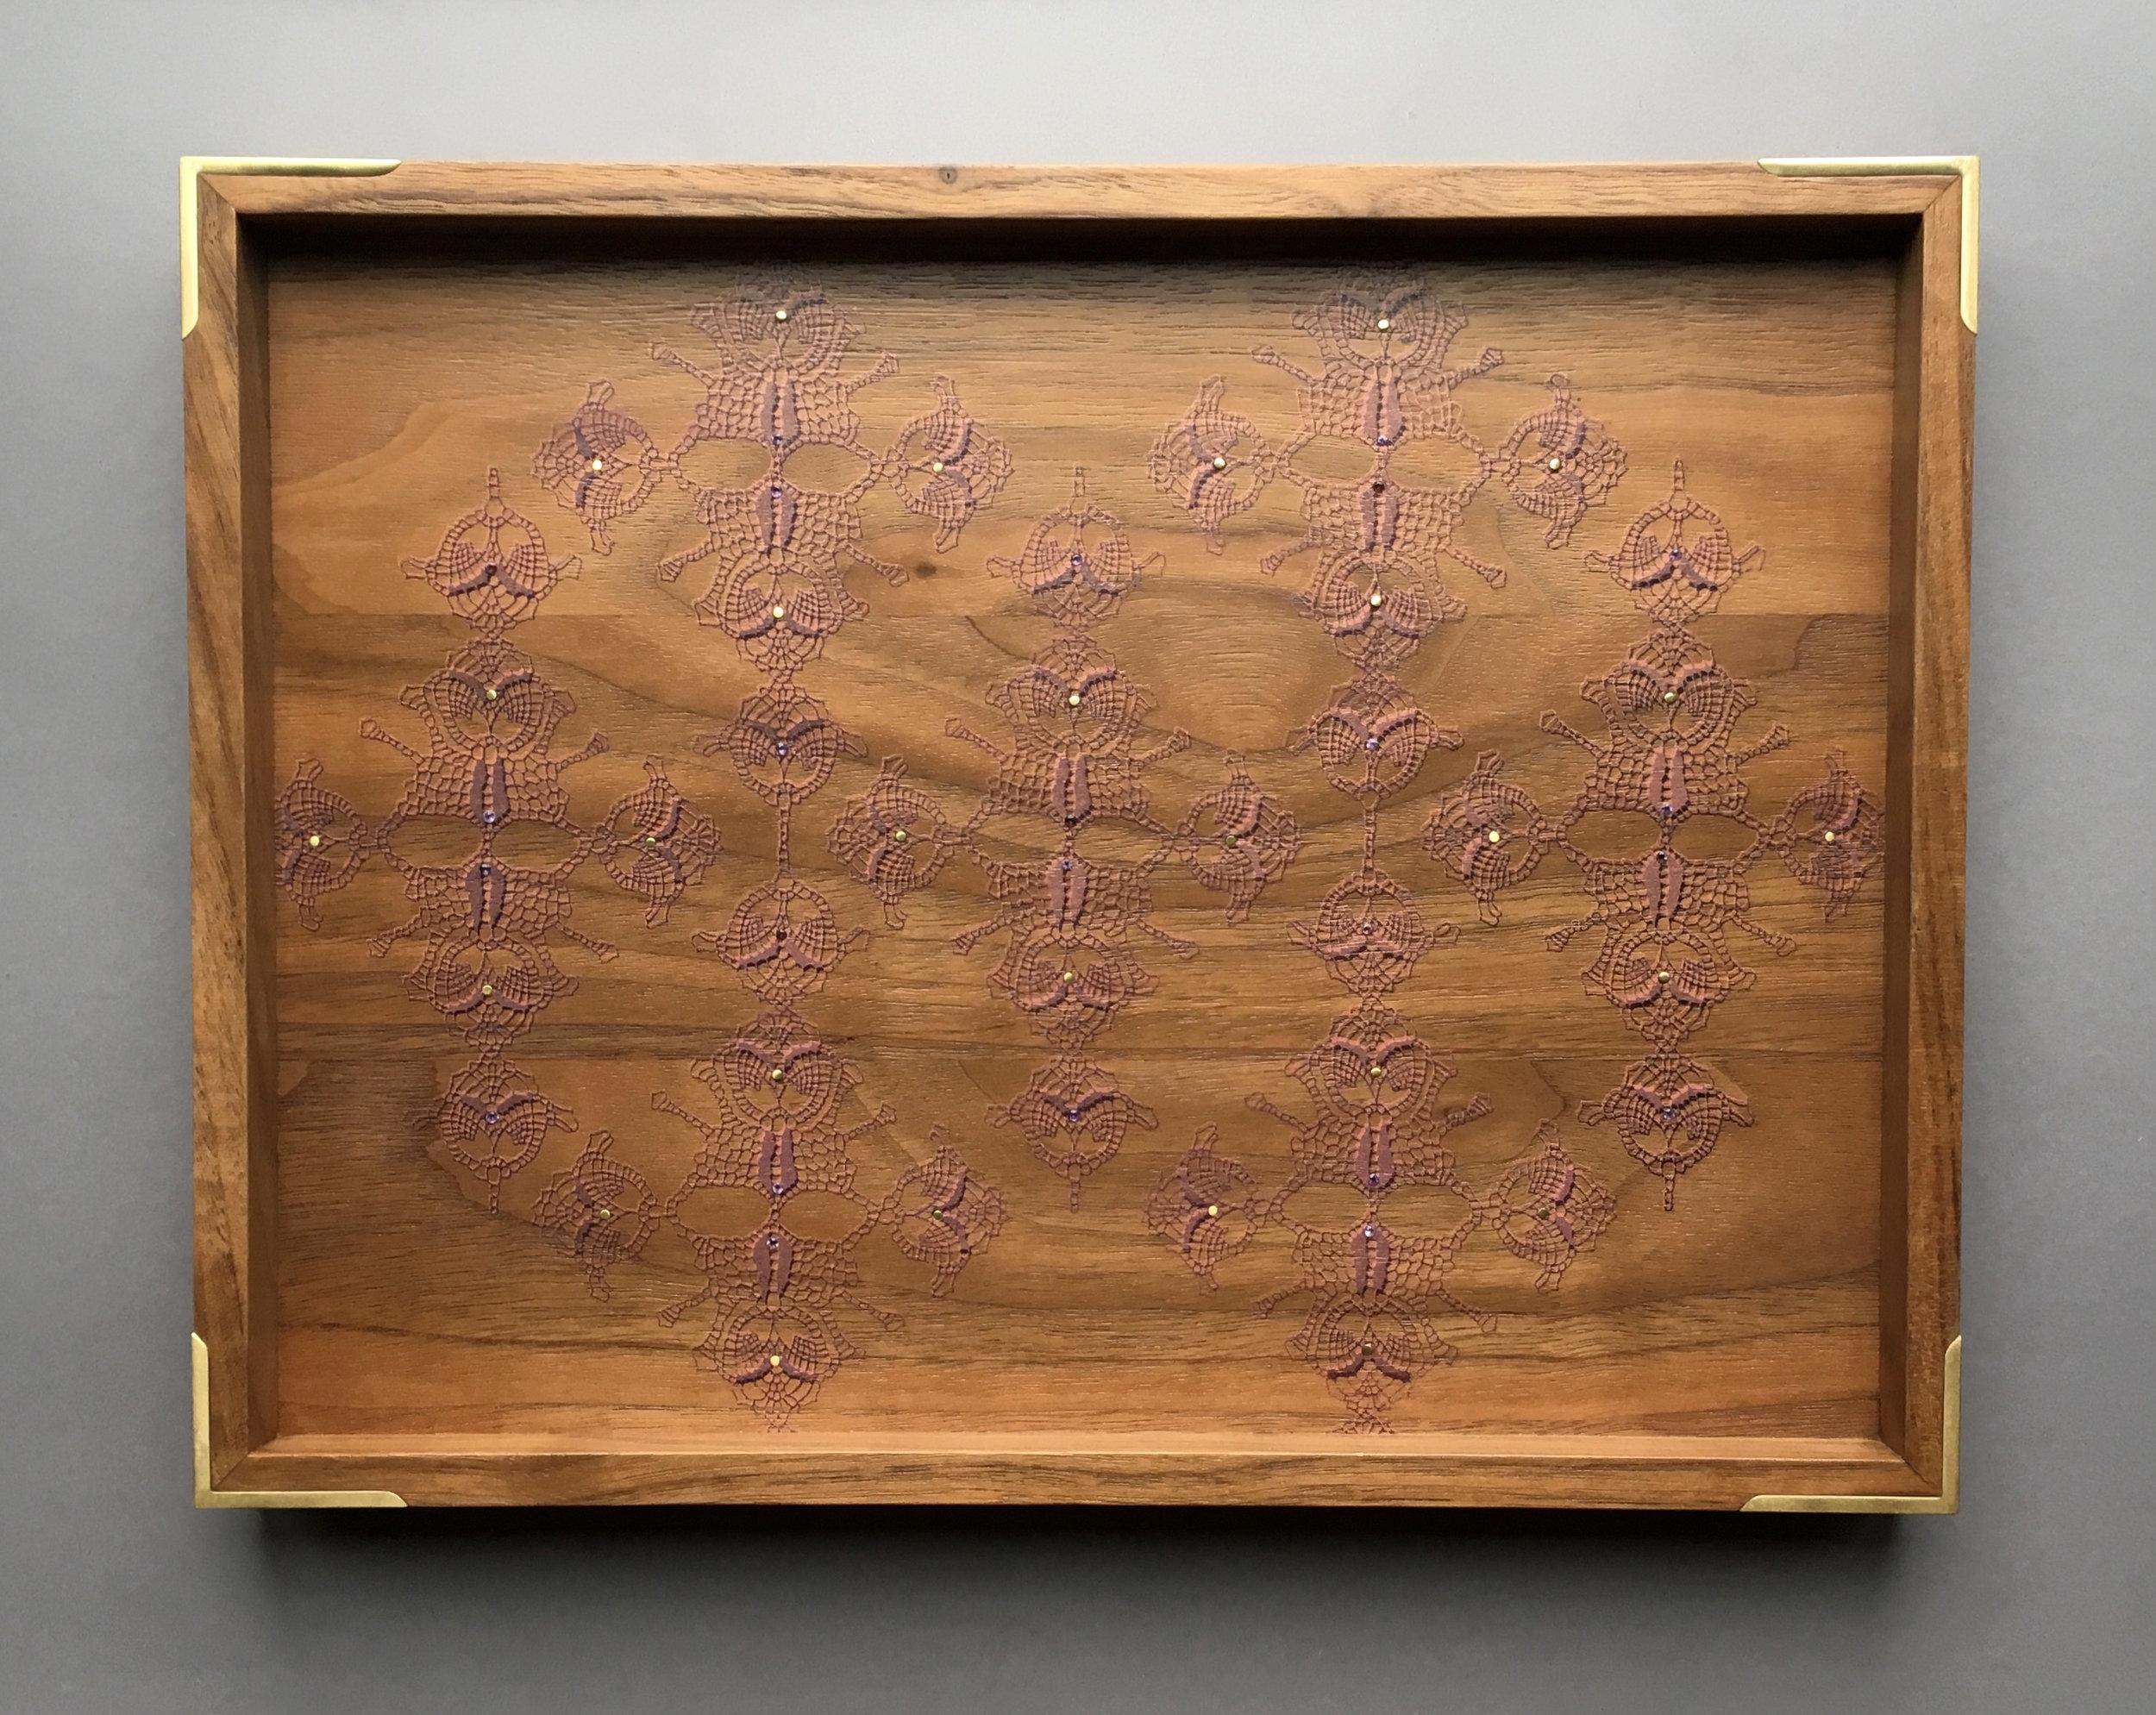 "straight lace  tray, walnut, 9.5"" x 12.5"" x 1.25"", brass and amethyst gemstones, $225"